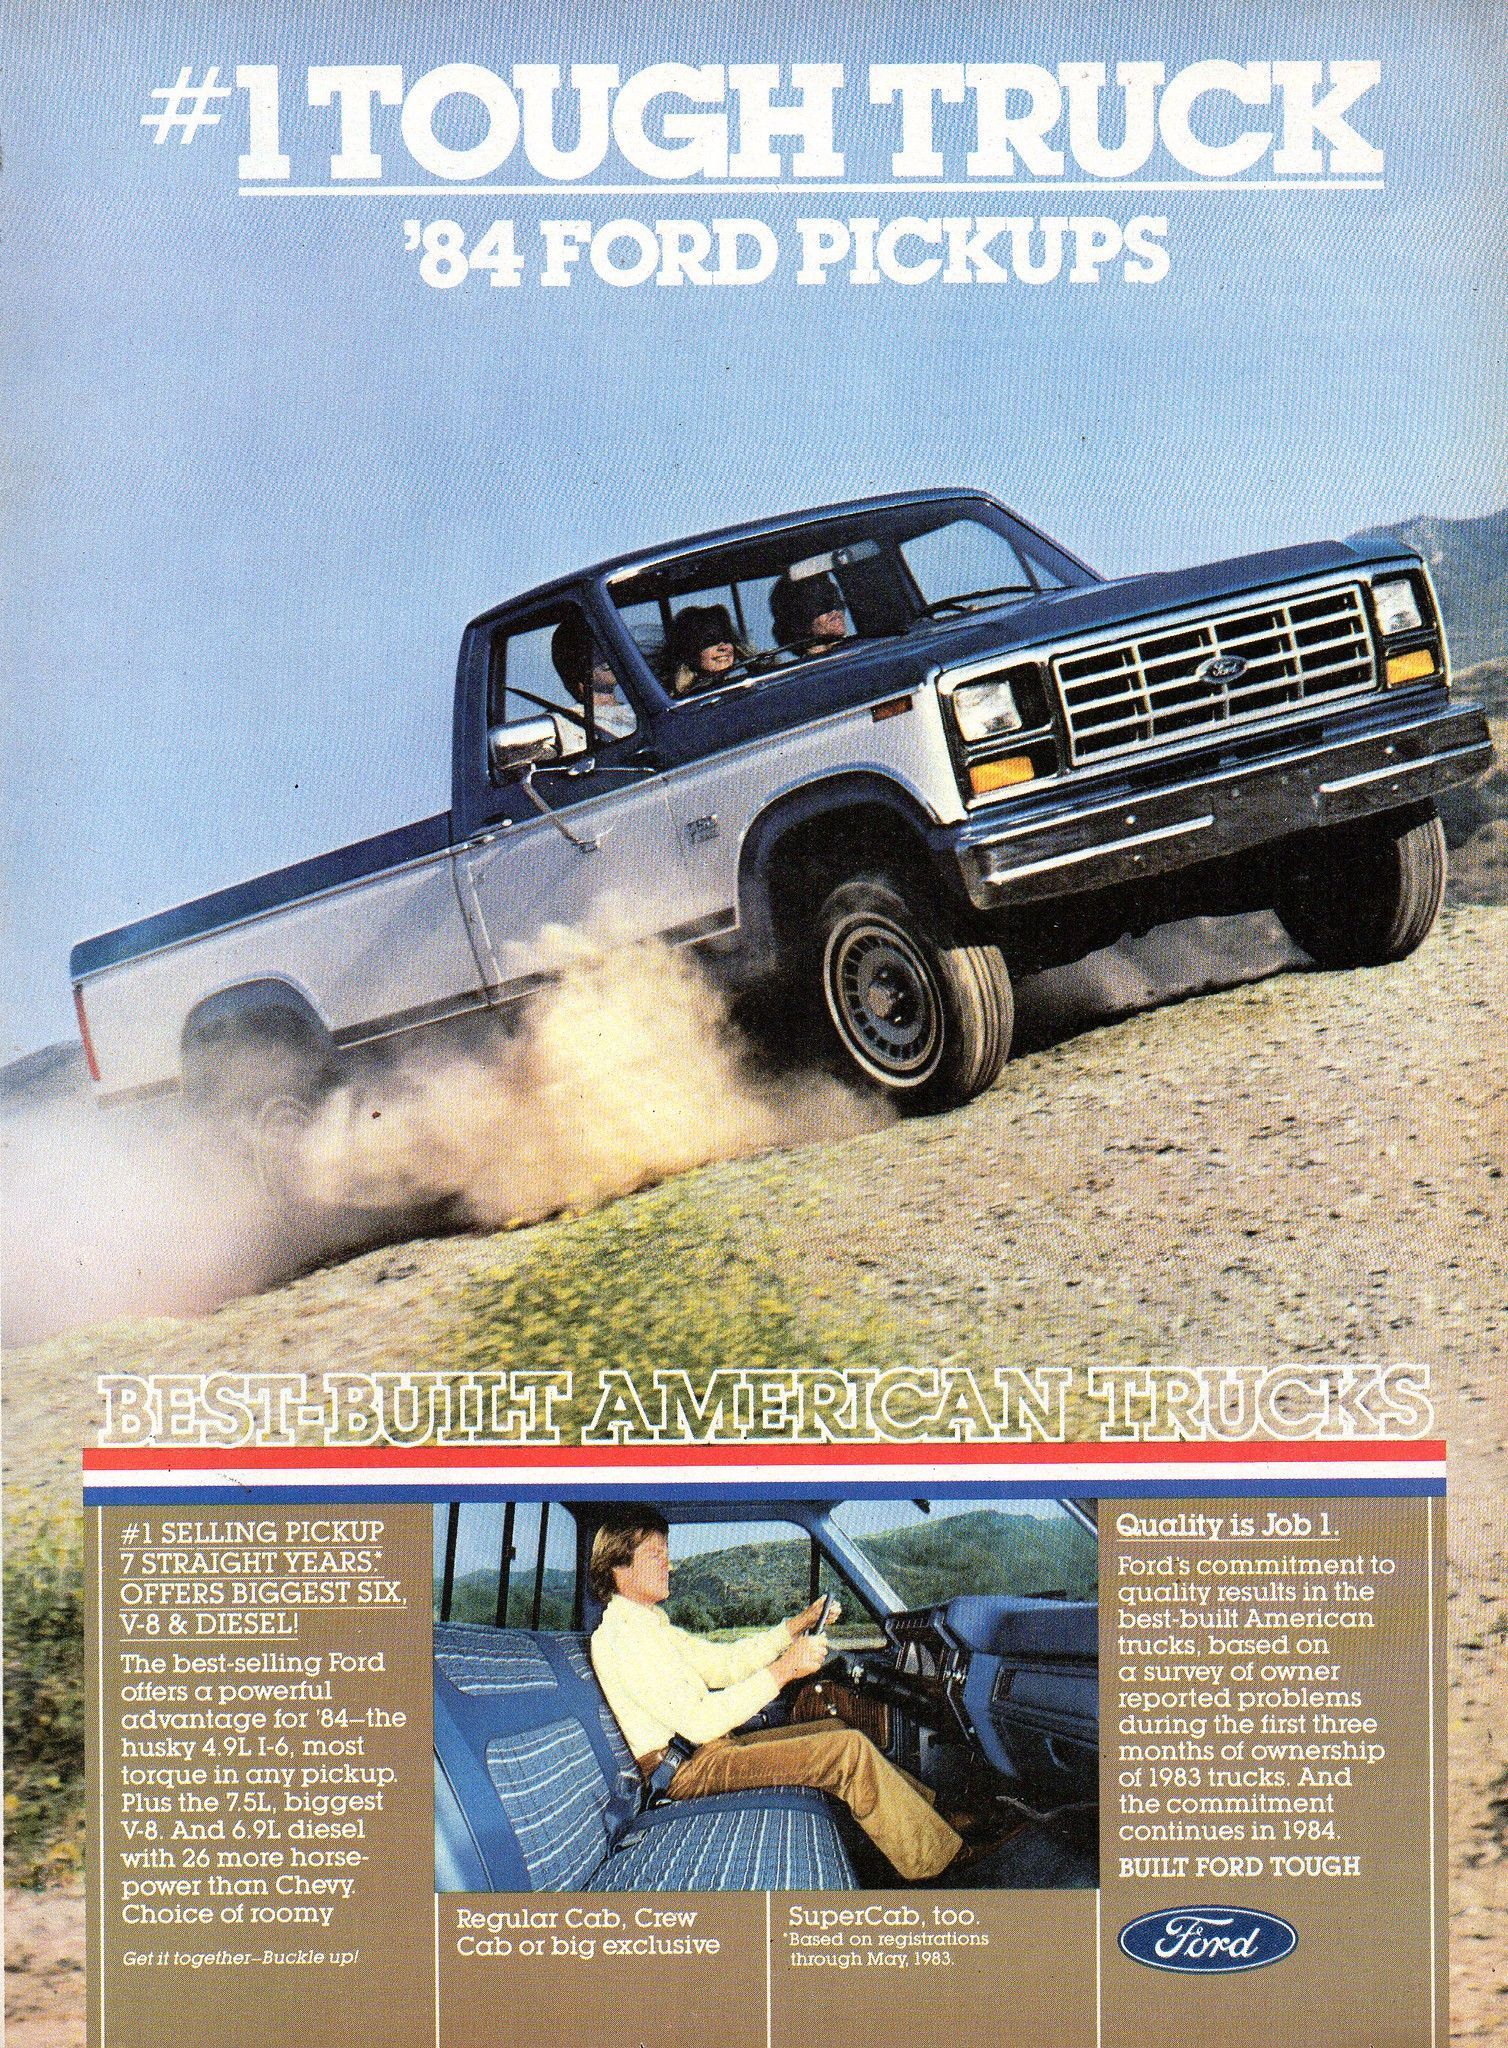 1984 Ford F Series Regular Cab Crew Cab SuperCab Pickup Trucks USA Original Magazine Advertisement